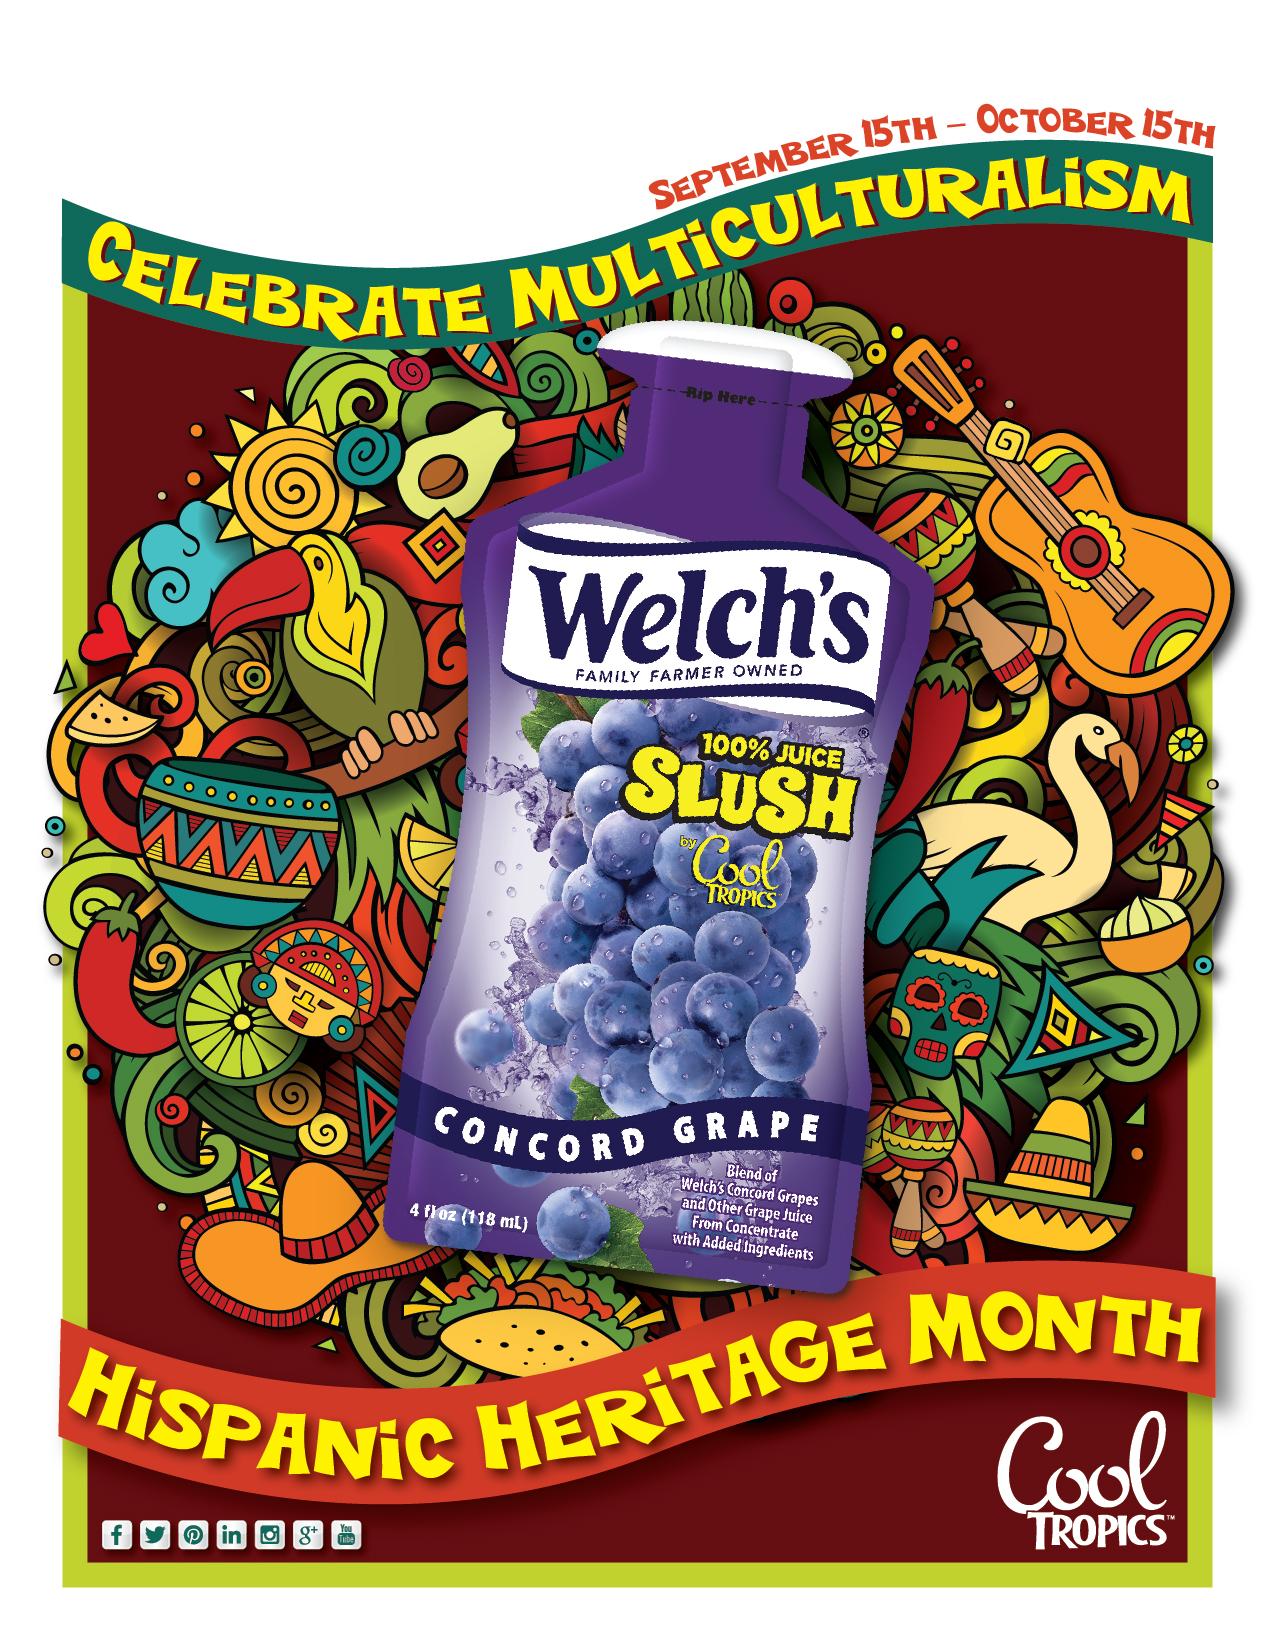 Hispanic Heritage Month Sept 15 Oct 15 Cool Tropics